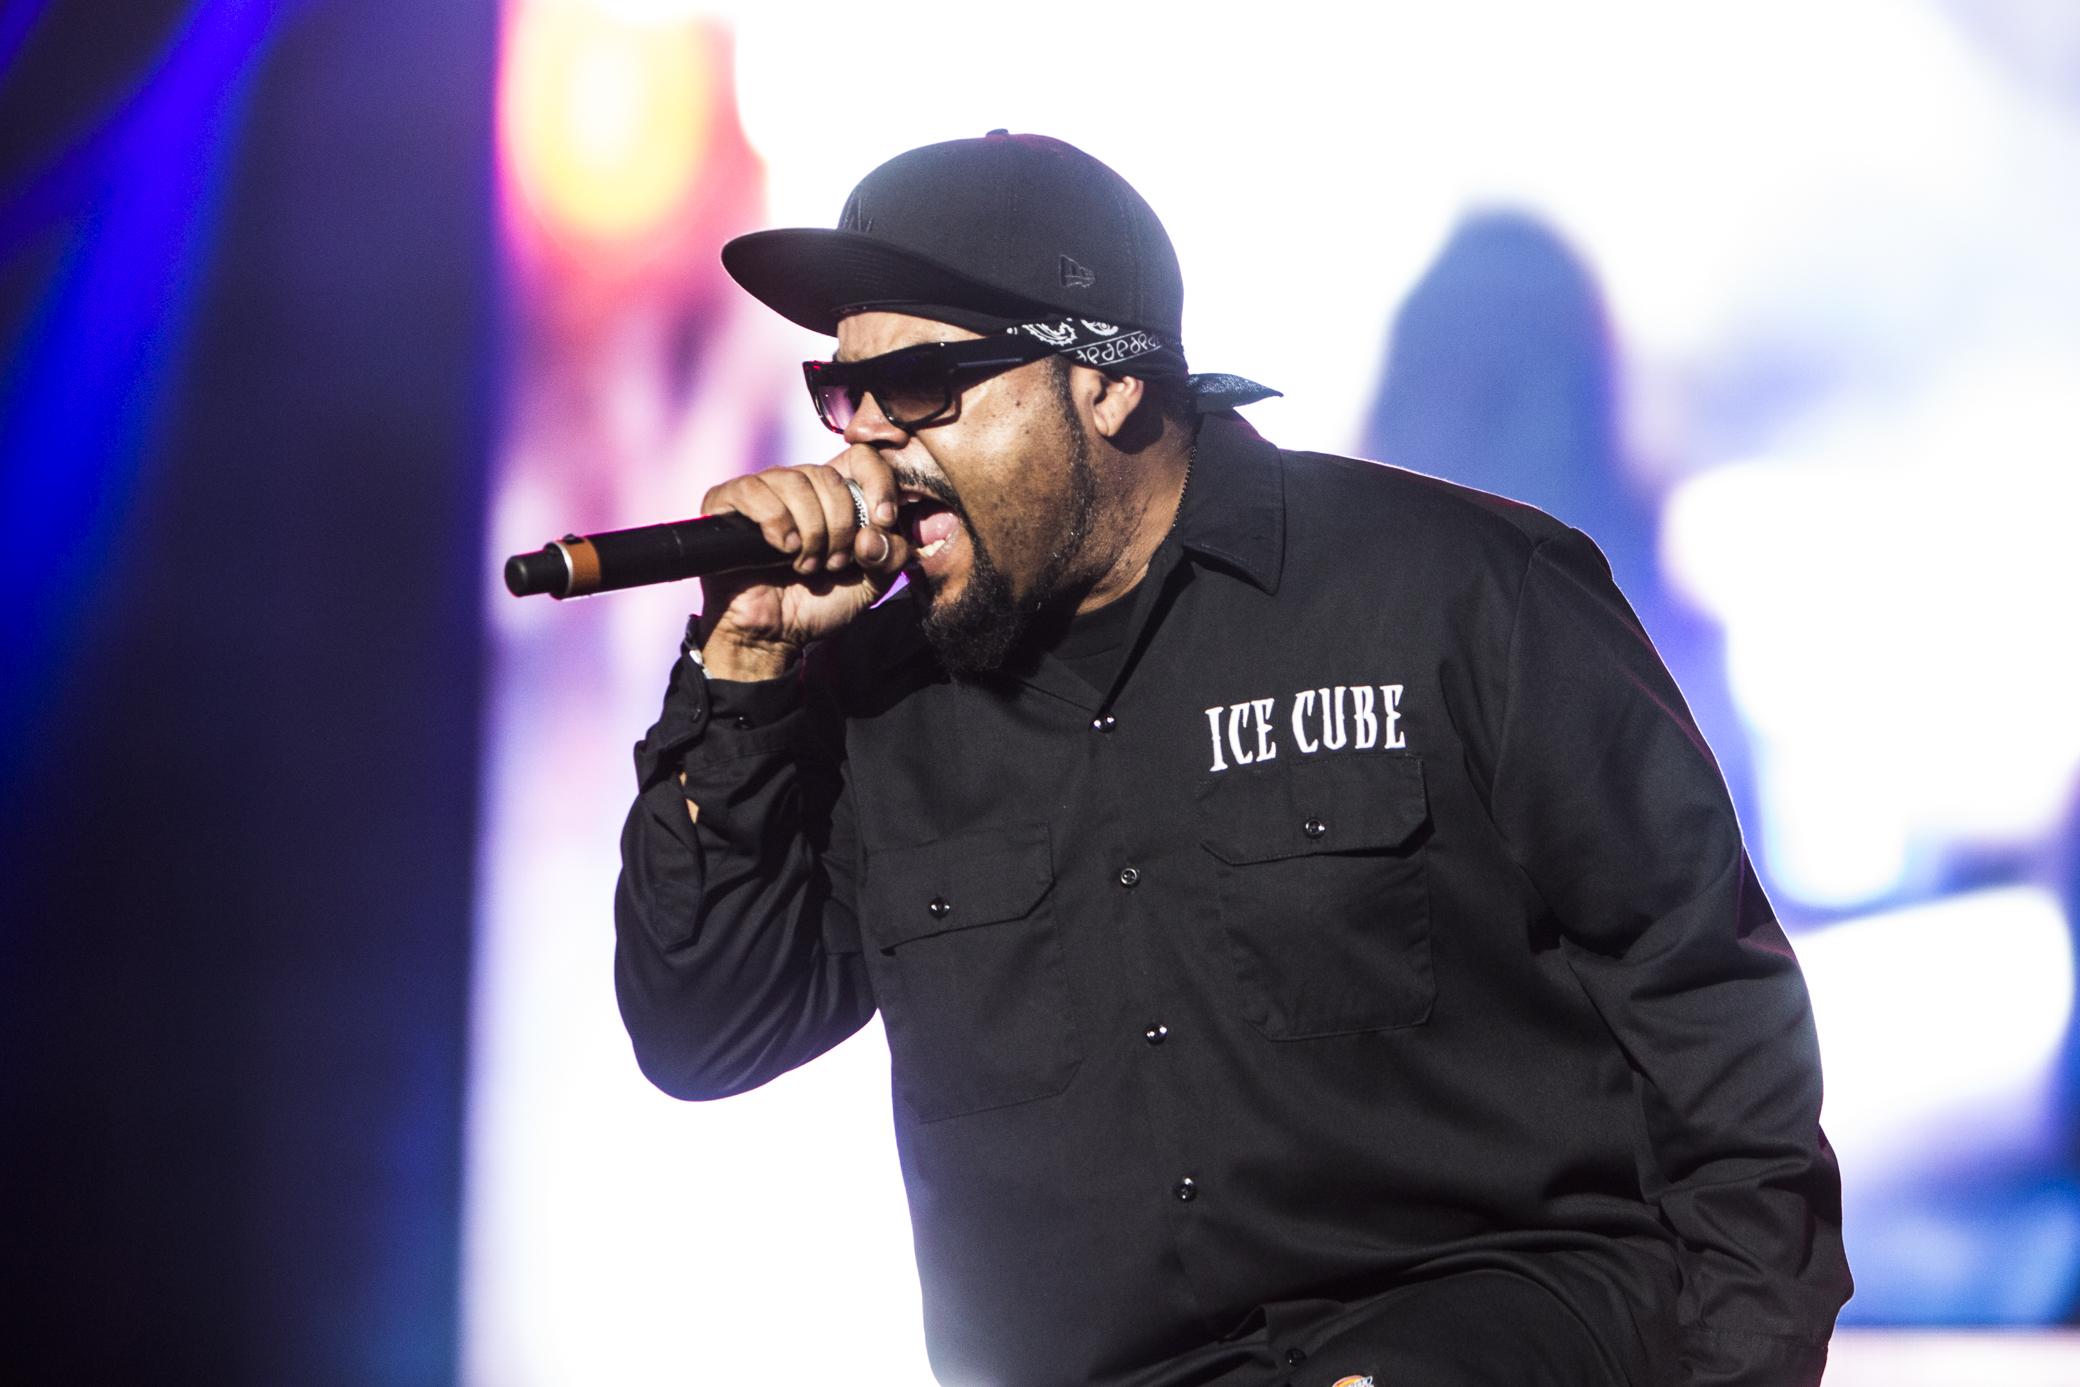 ice cube 6 Ice Cube.6